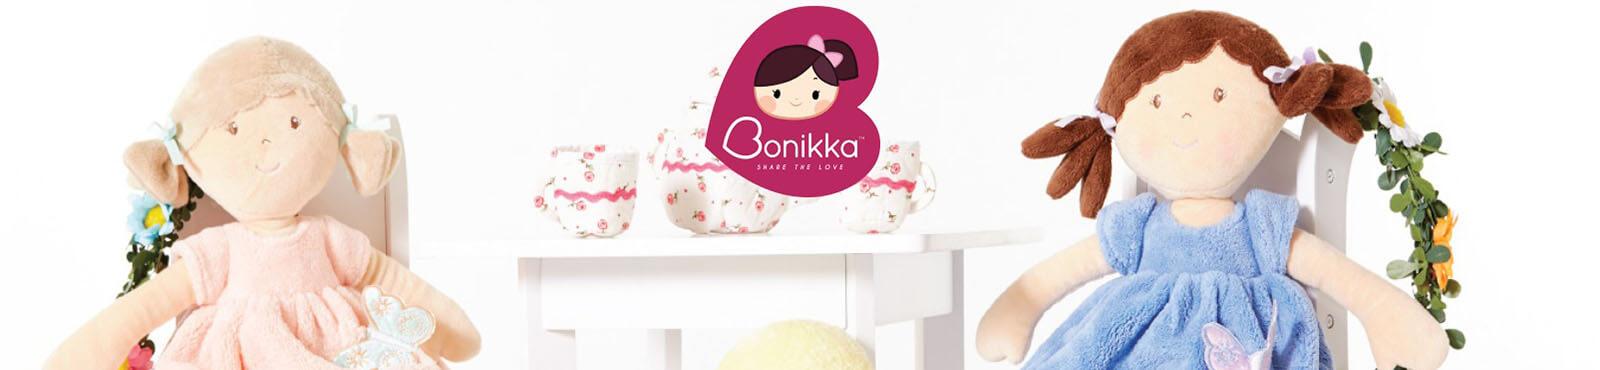 Bonikka muñecas